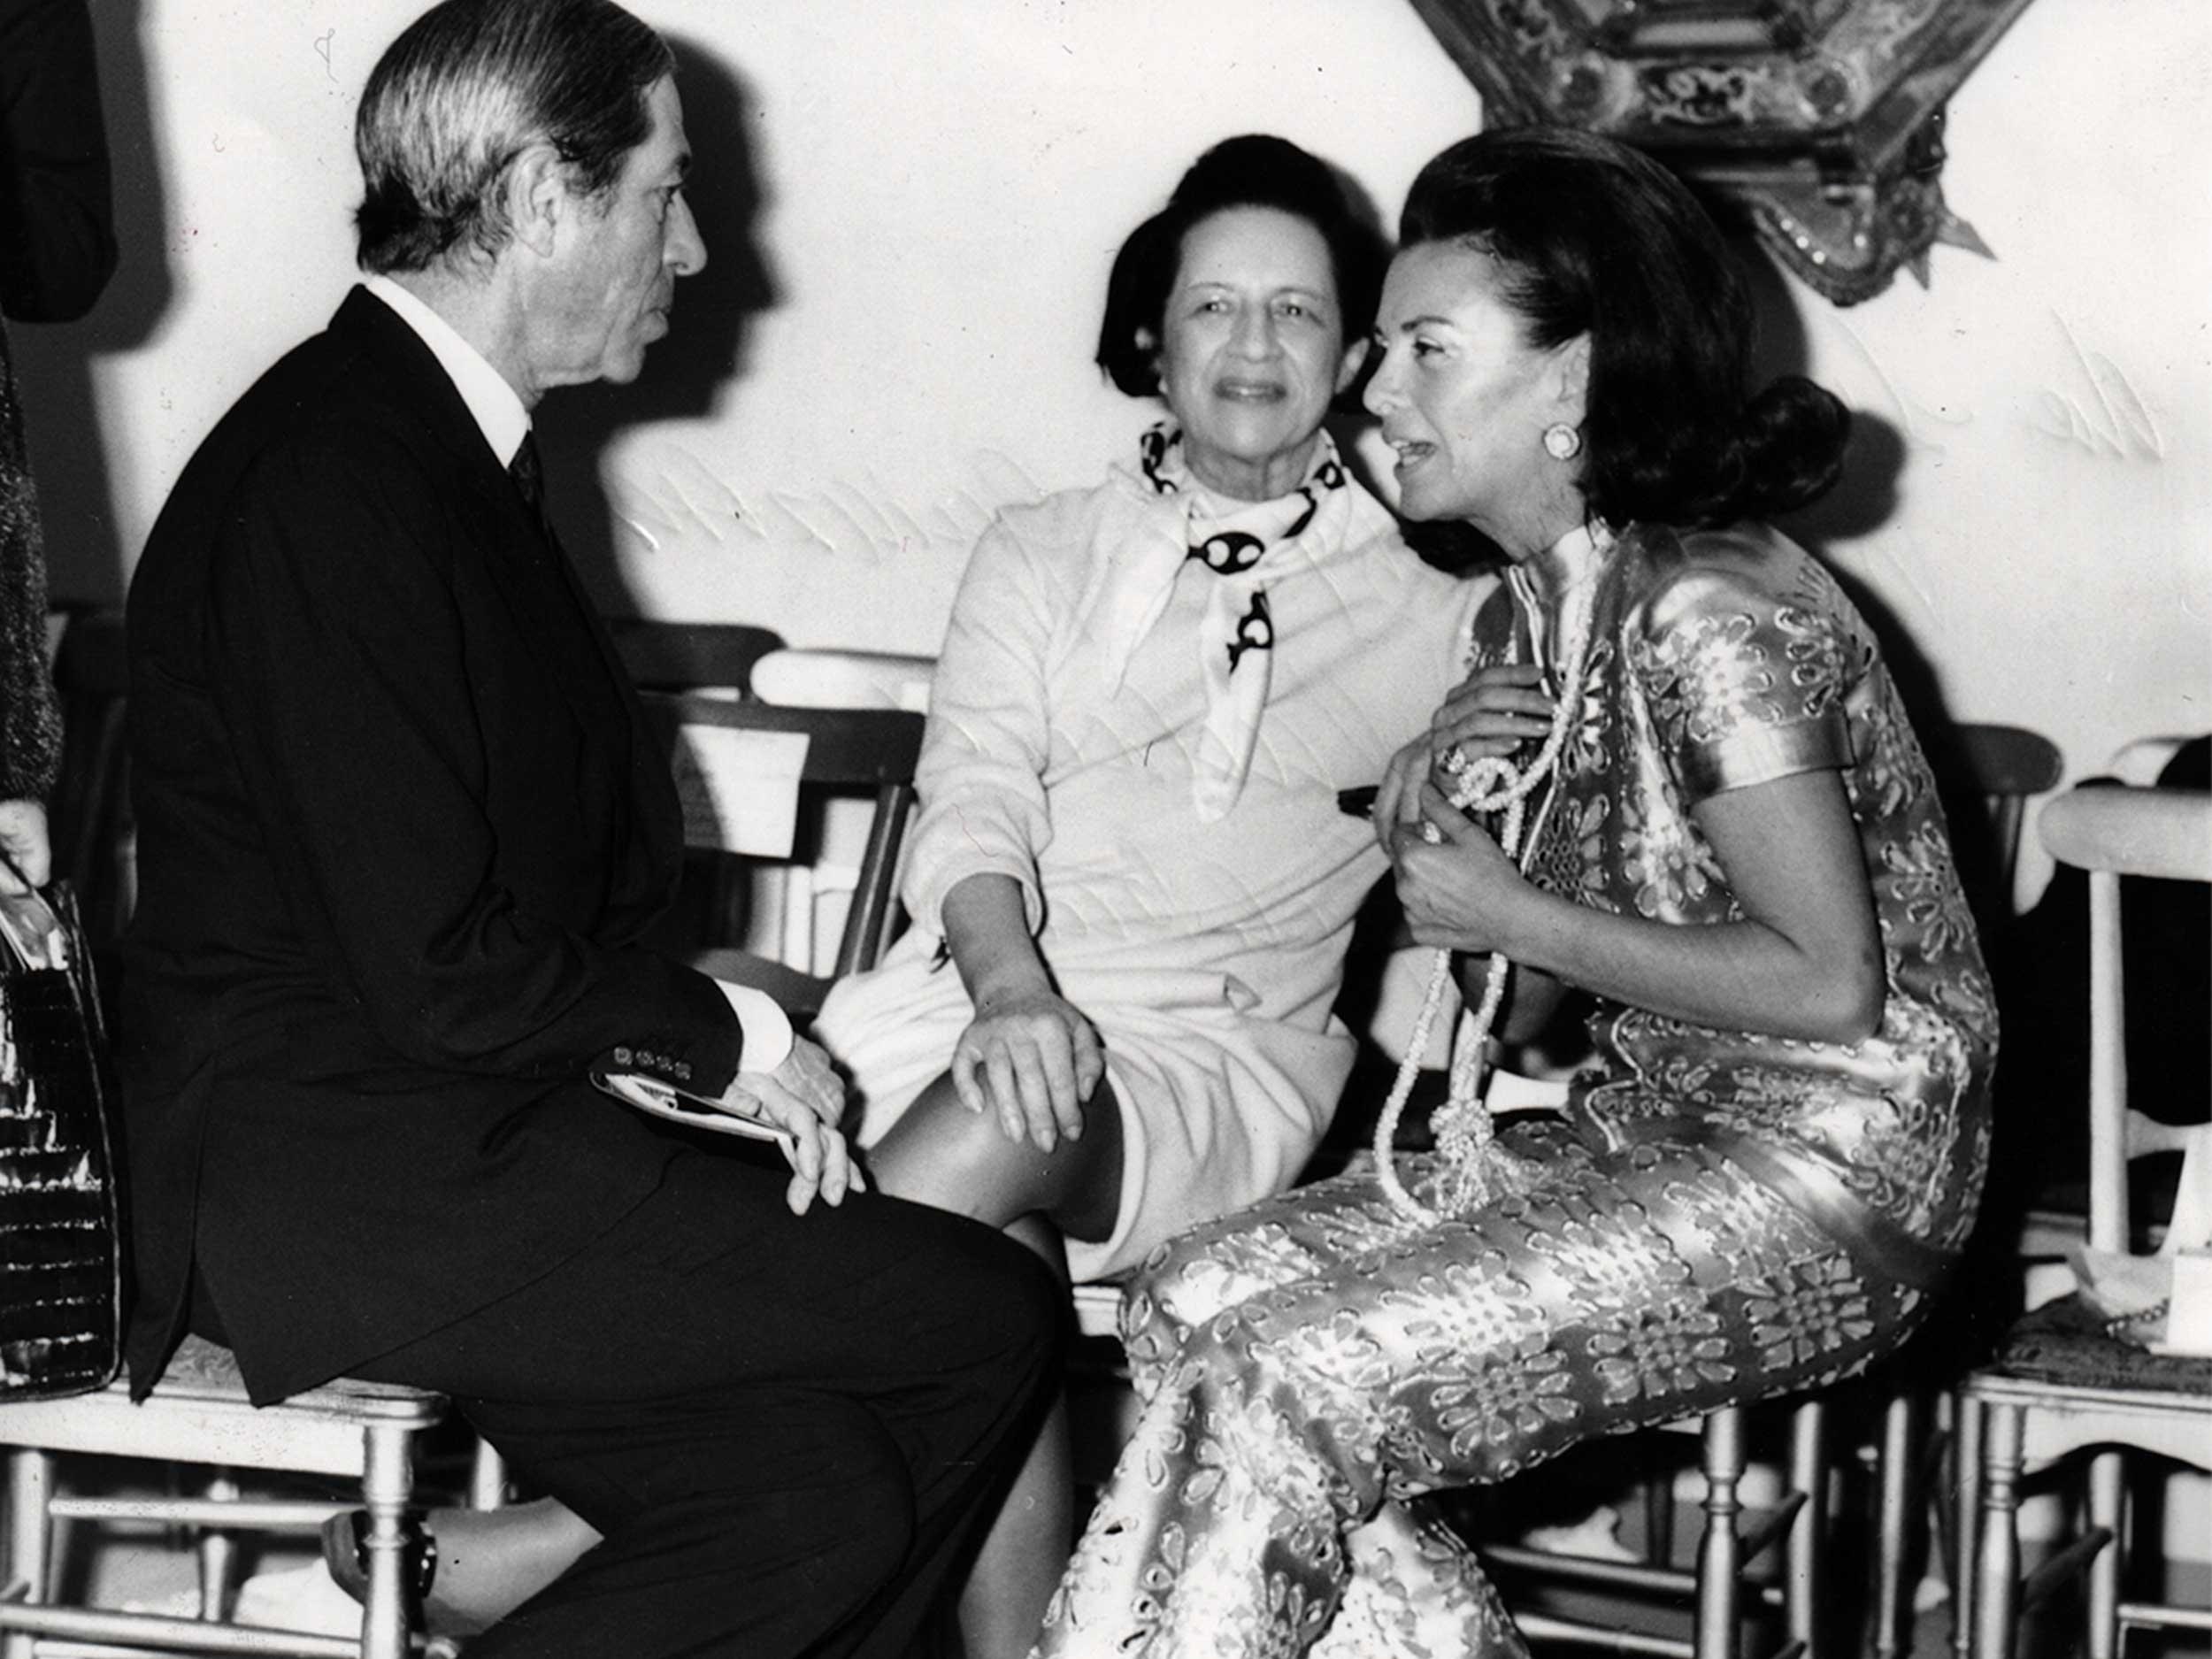 Sergio Zambon reinvigorates the 'power pyjama,' a favorite of Jacqueline Kennedy and Diana Vreeland